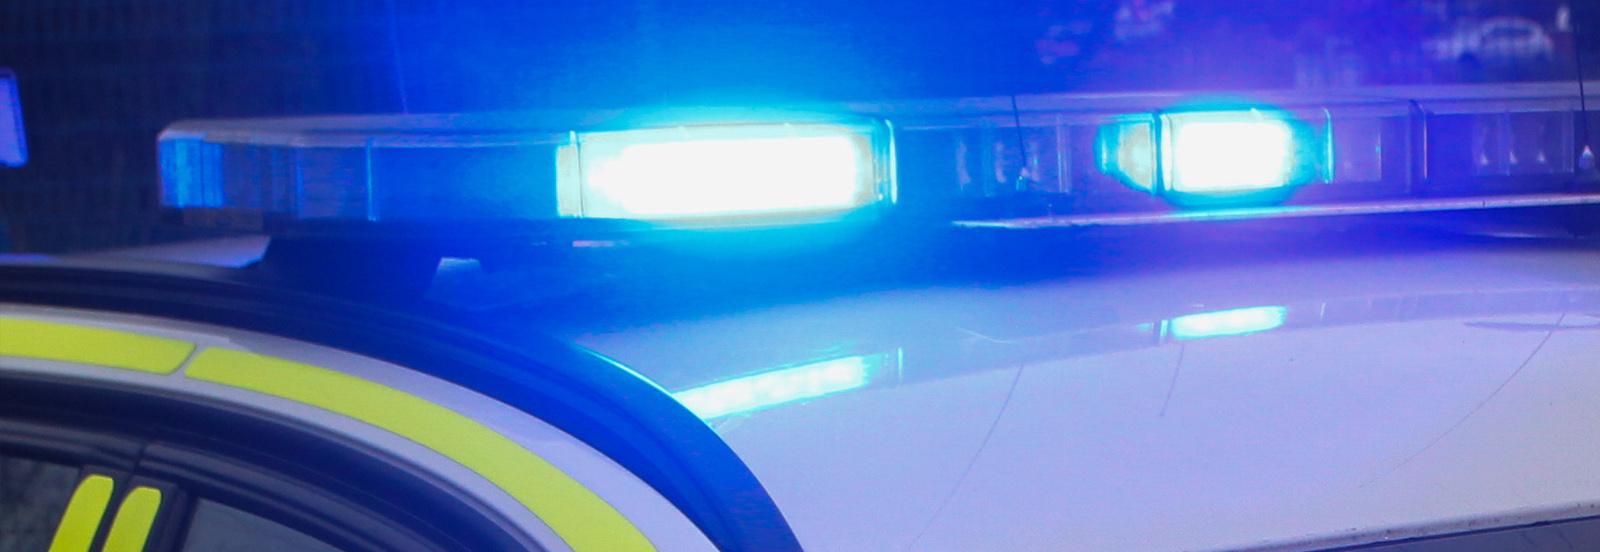 police vehicle blue light atop